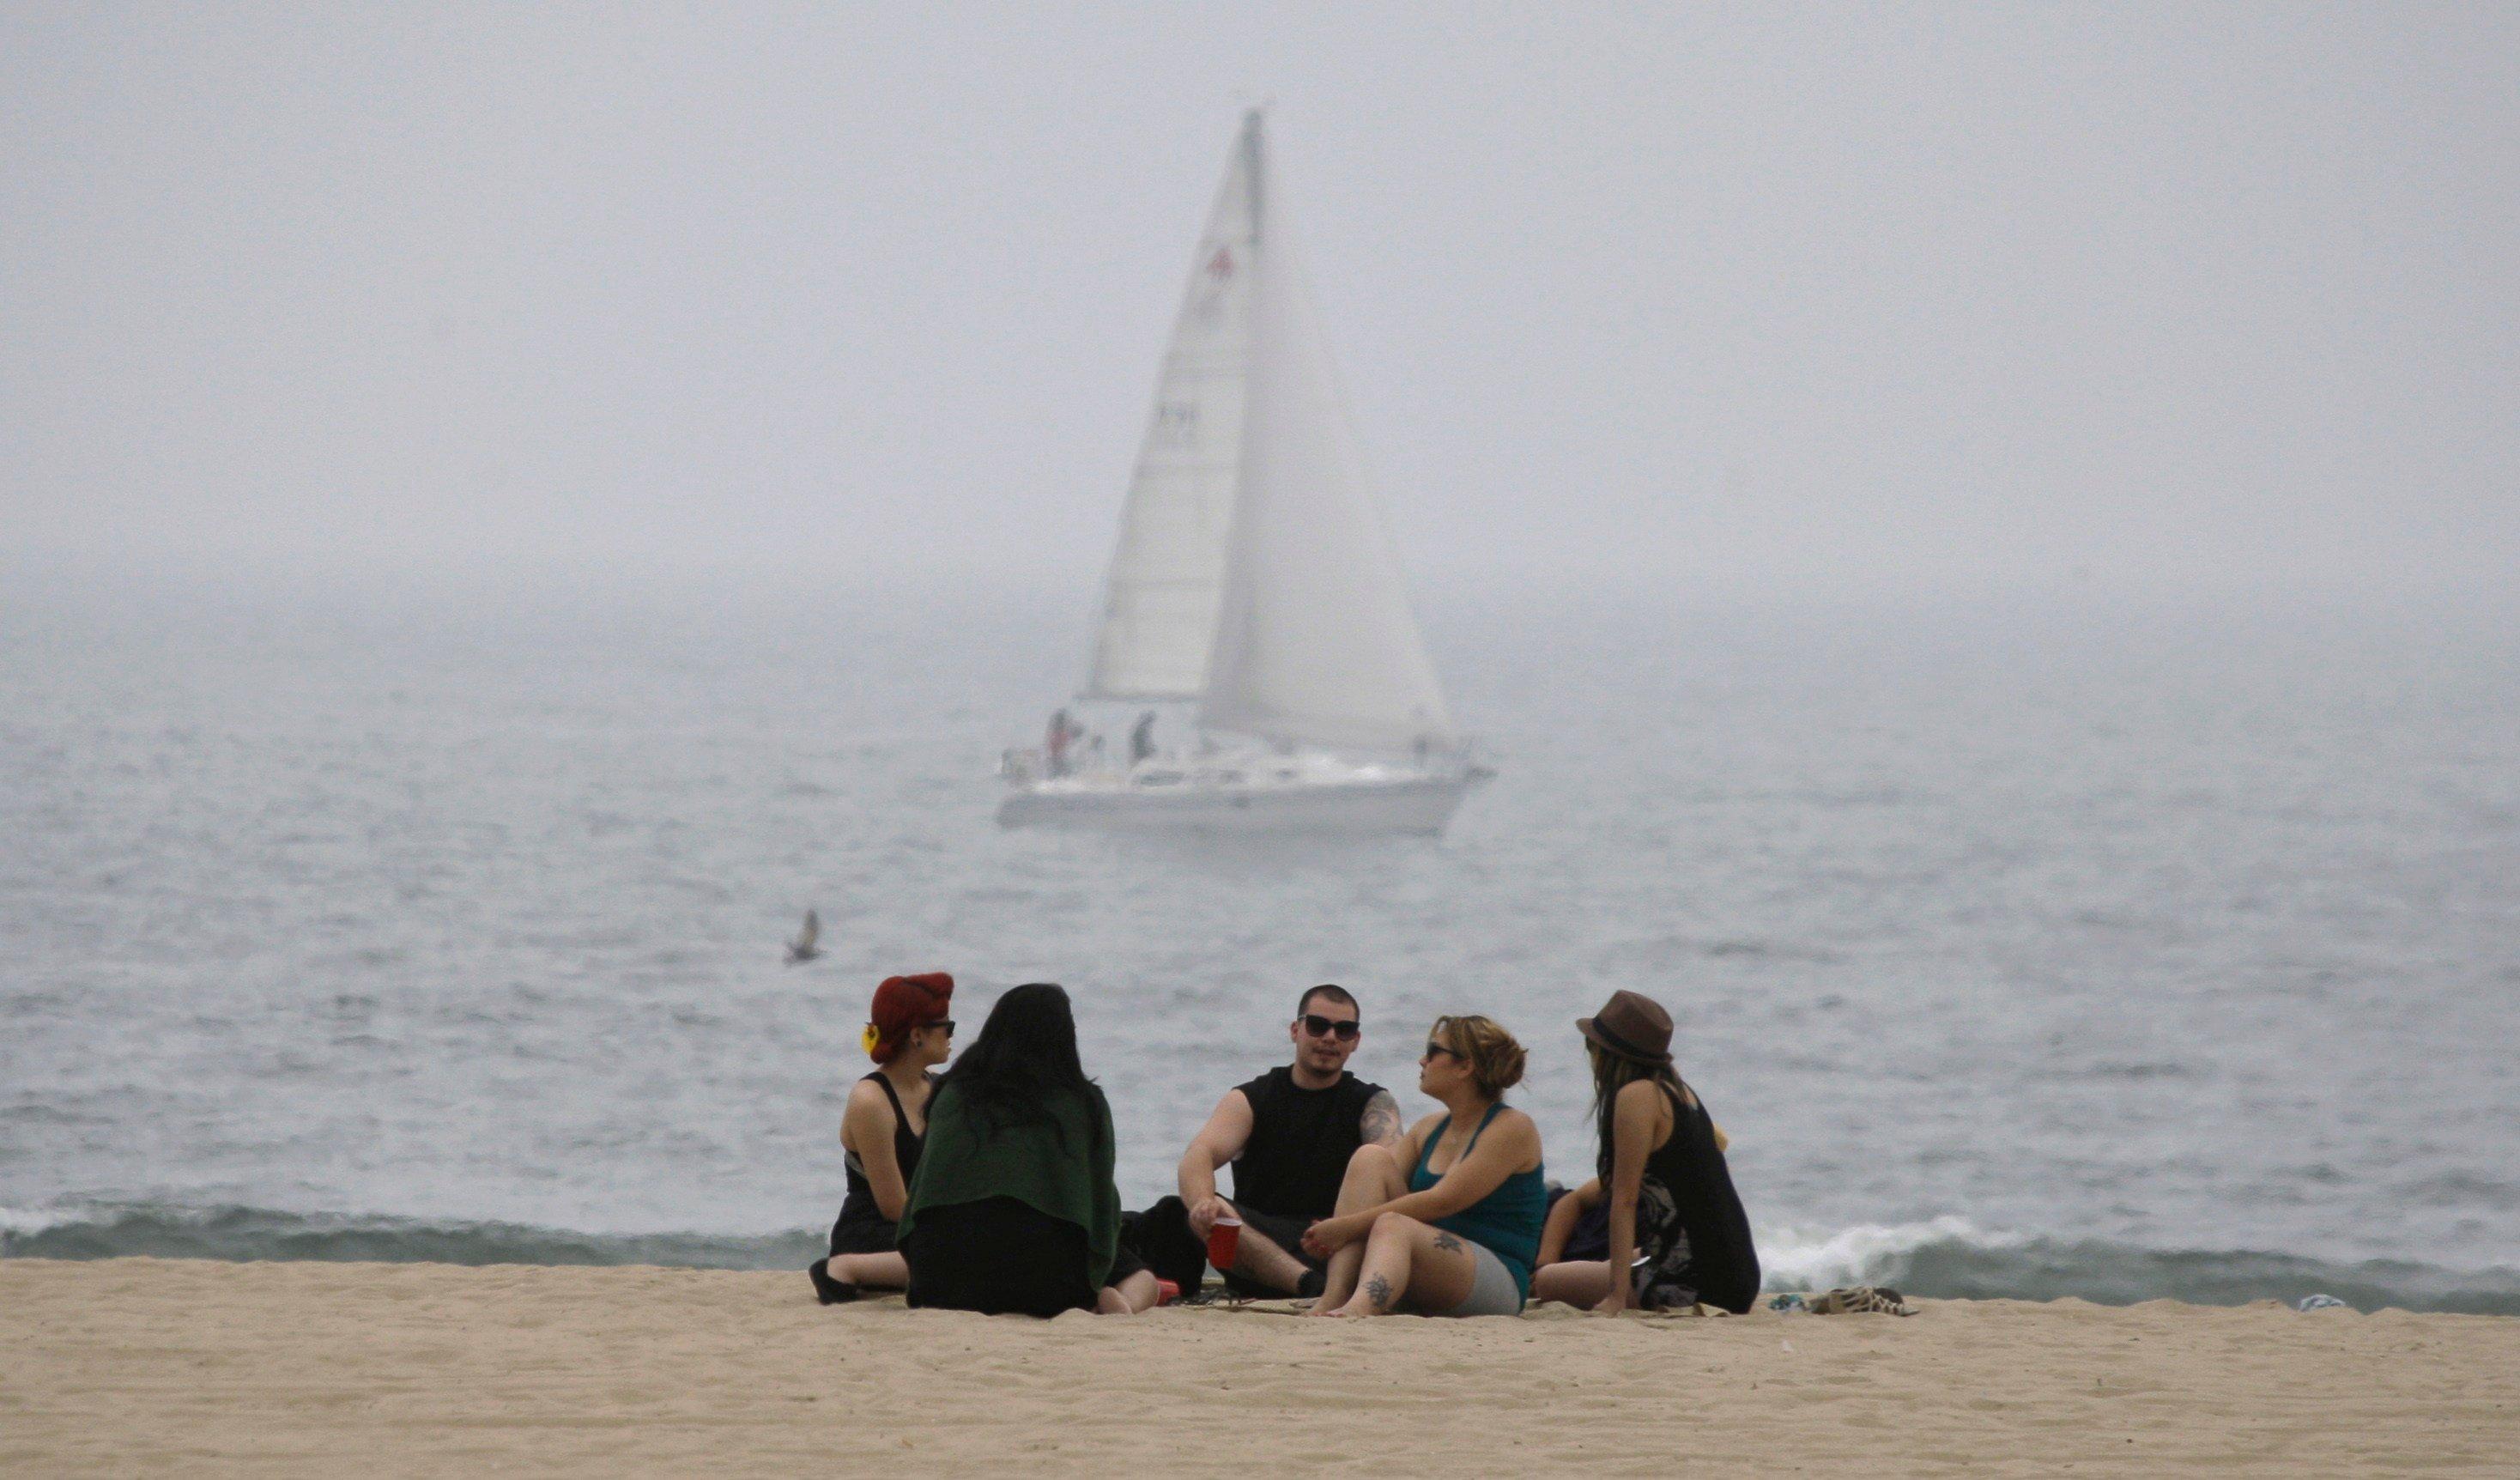 Missing: Sunshine in SoCal   Phoenix Weather   azfamily com